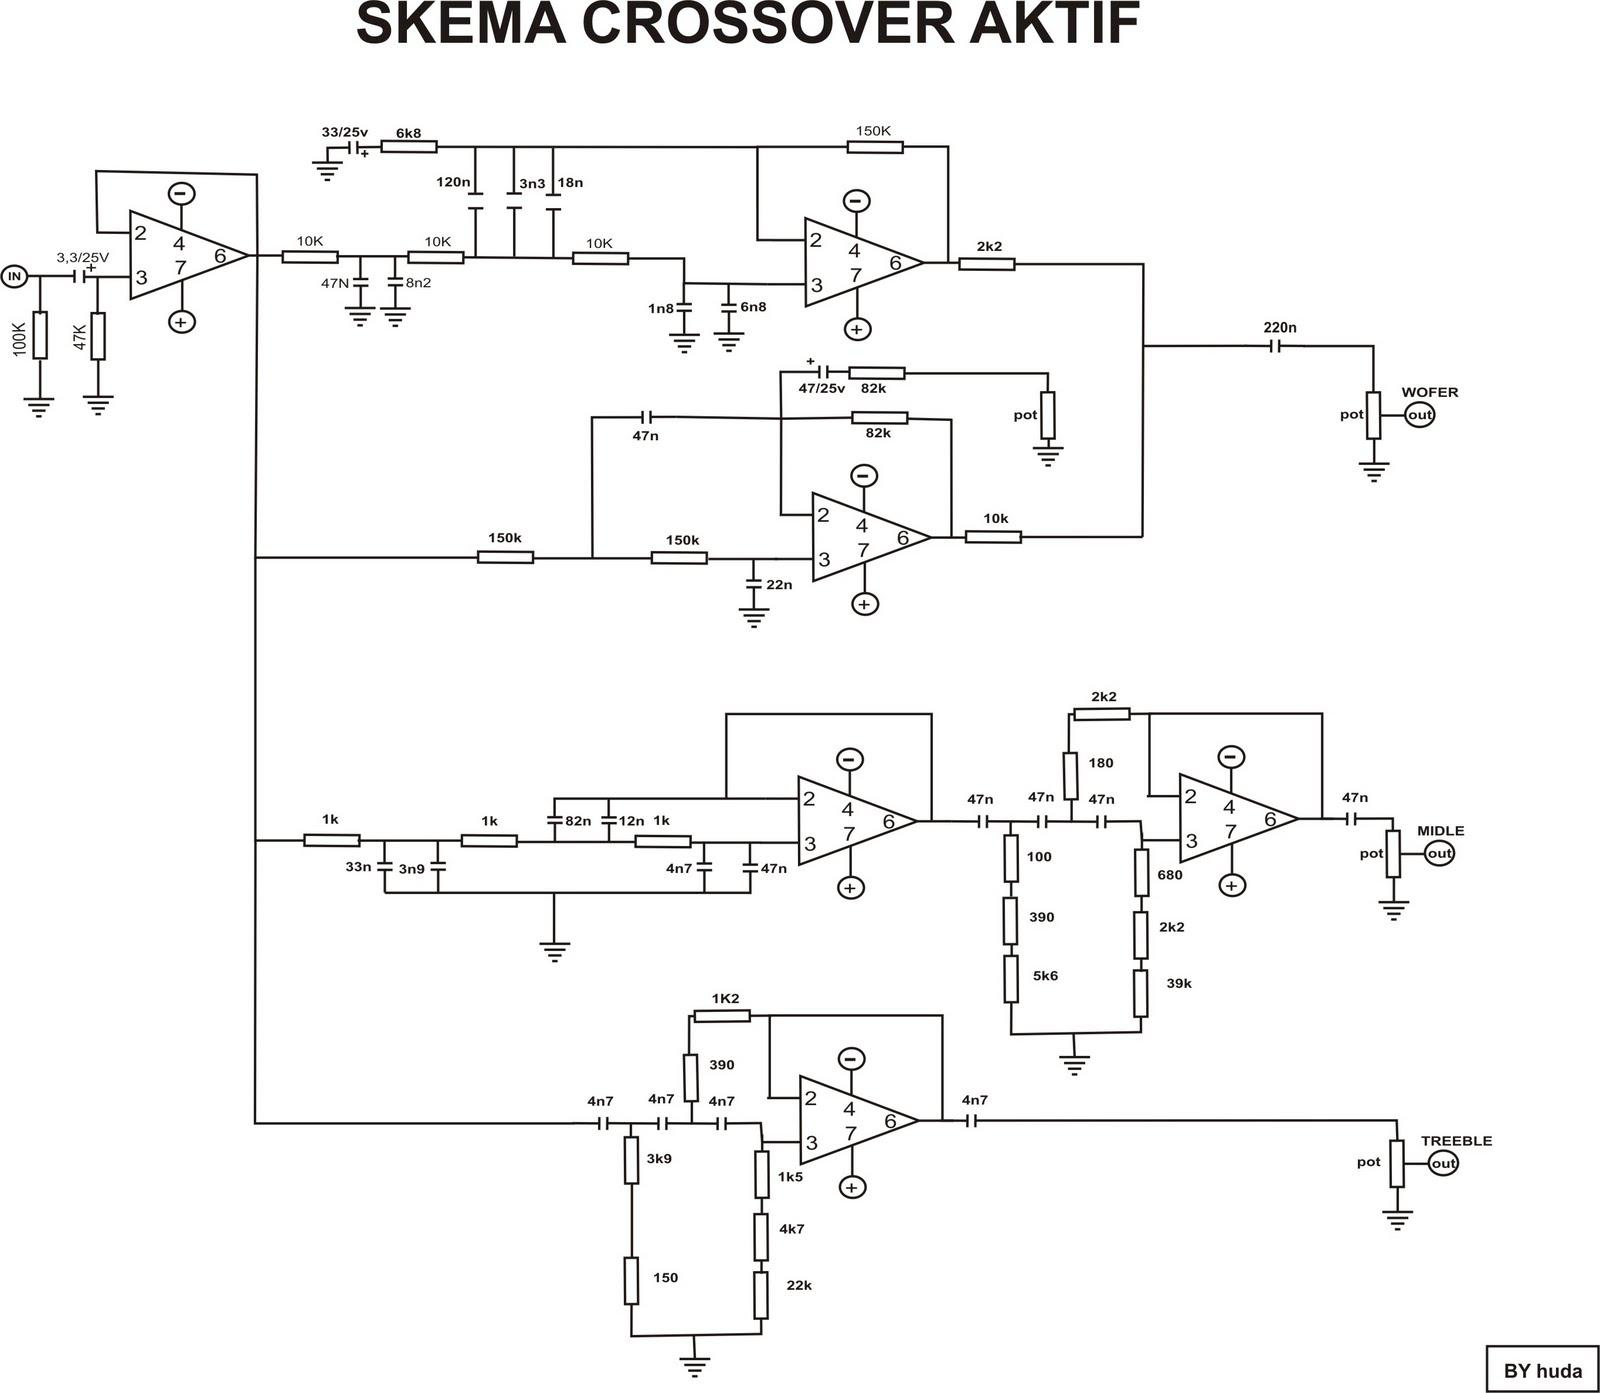 skema-skema elektronika: SKEMA SUBWOFER DAN CROSSOVER AKTIIF